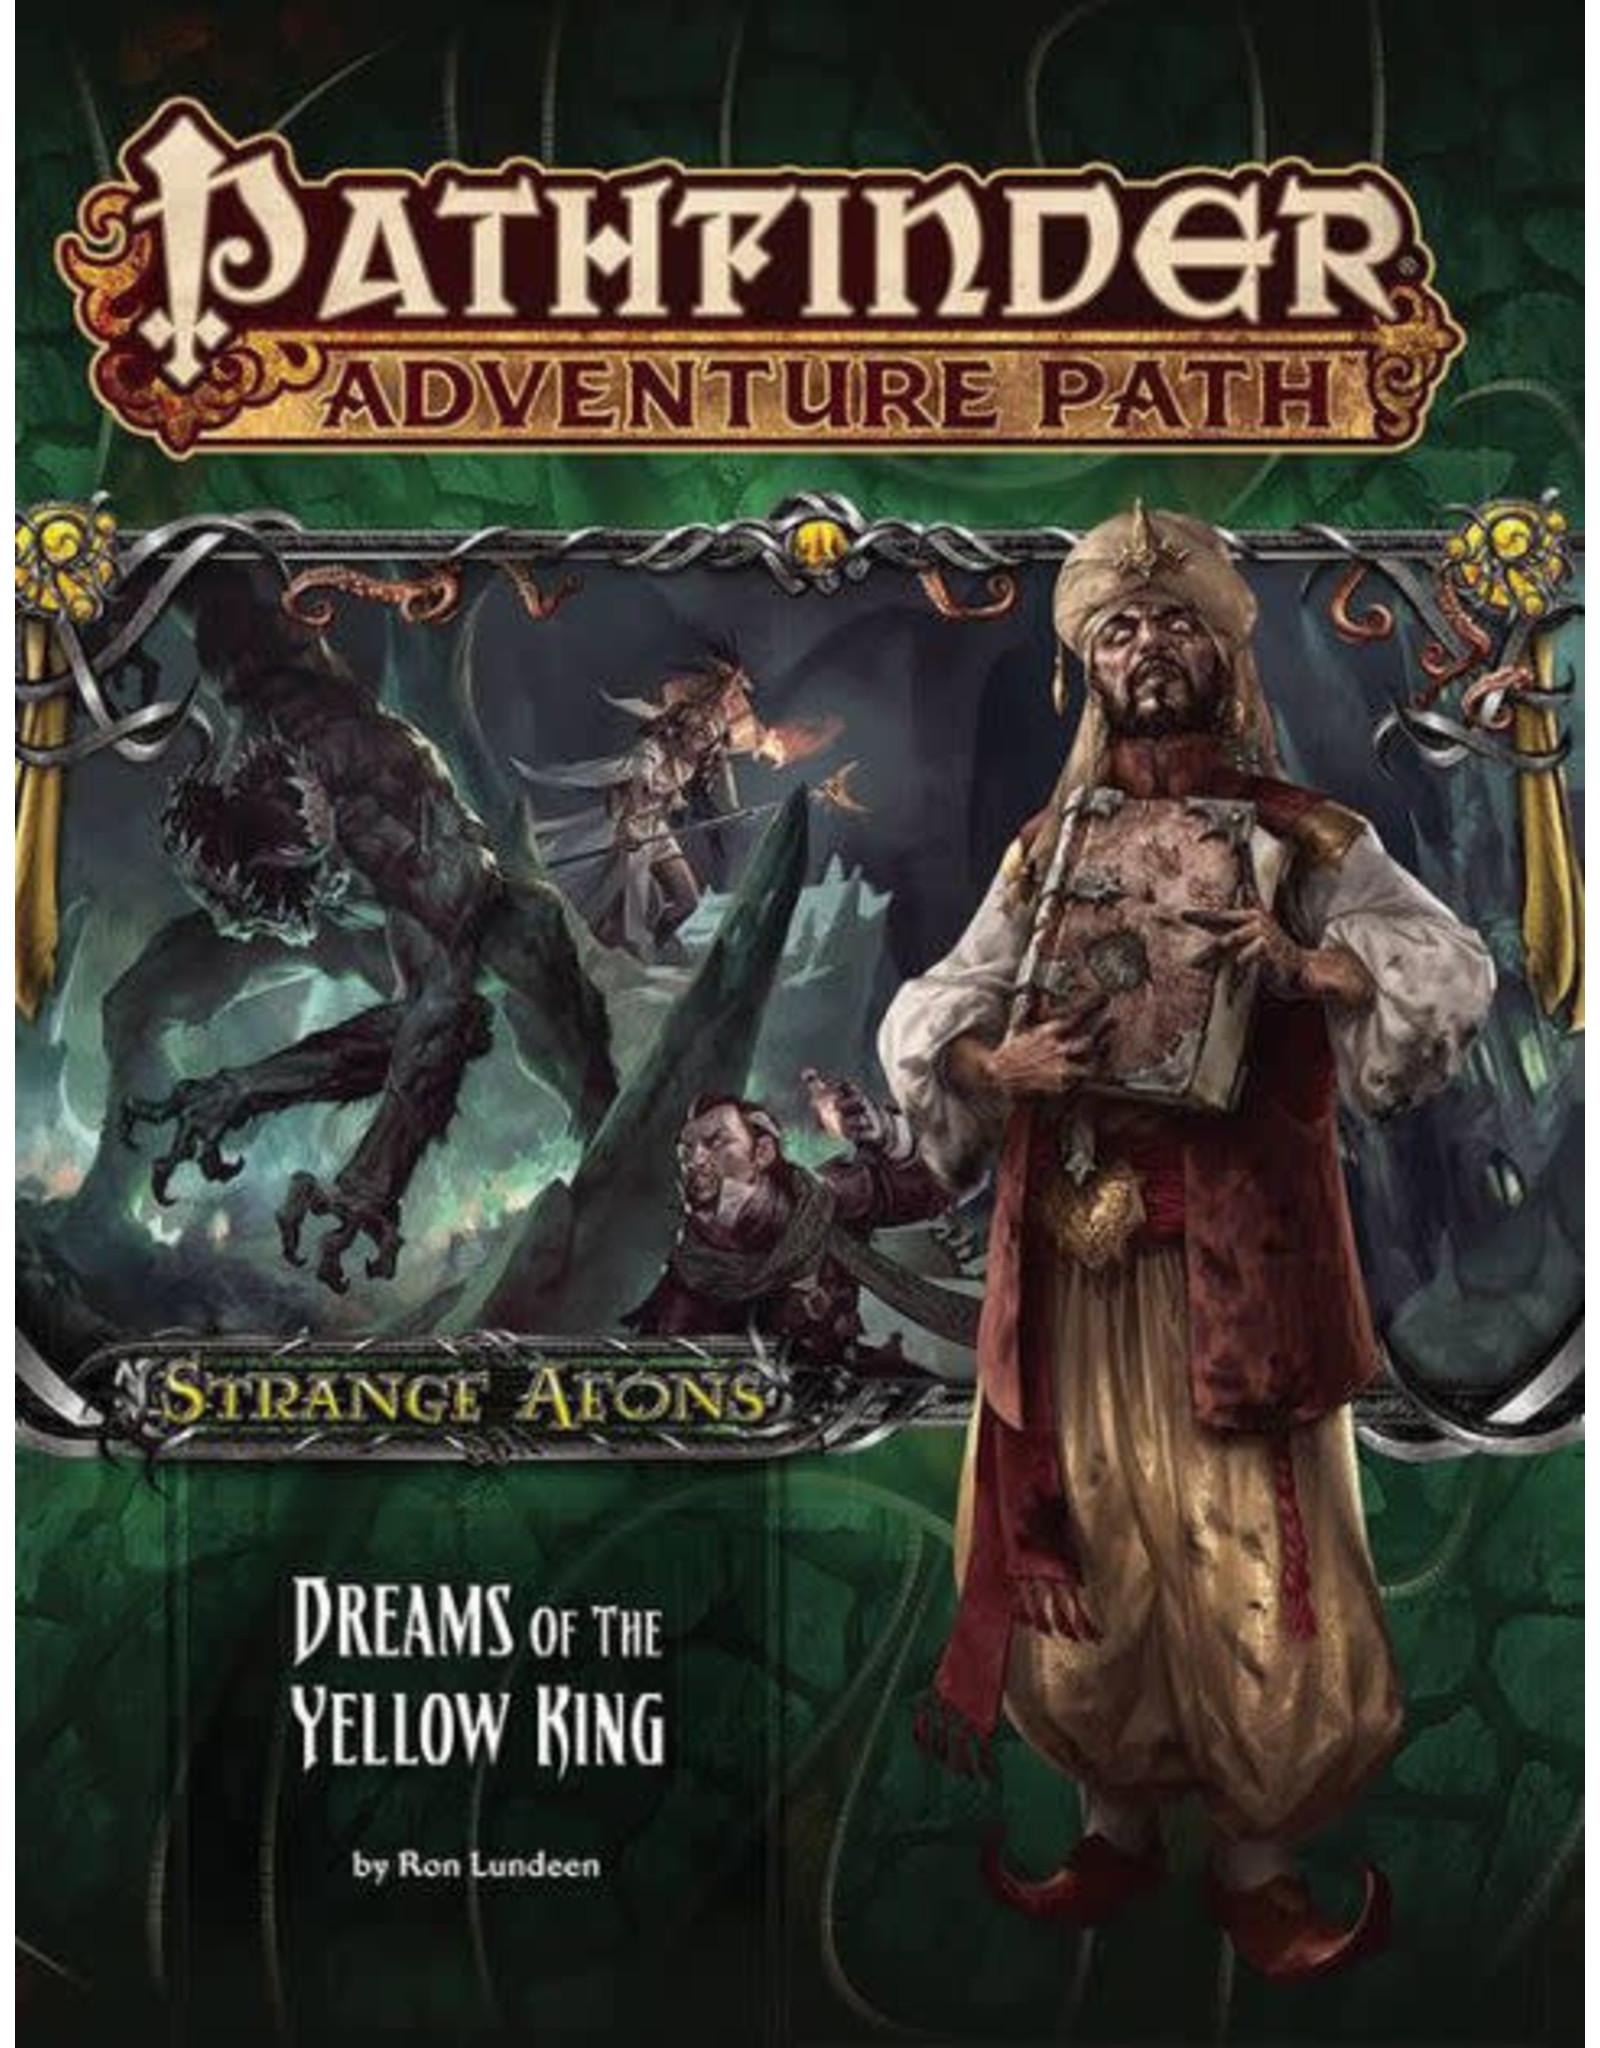 Pathfinder Adventure Path #111: Strange Aeons - Dreams of the Yellow King